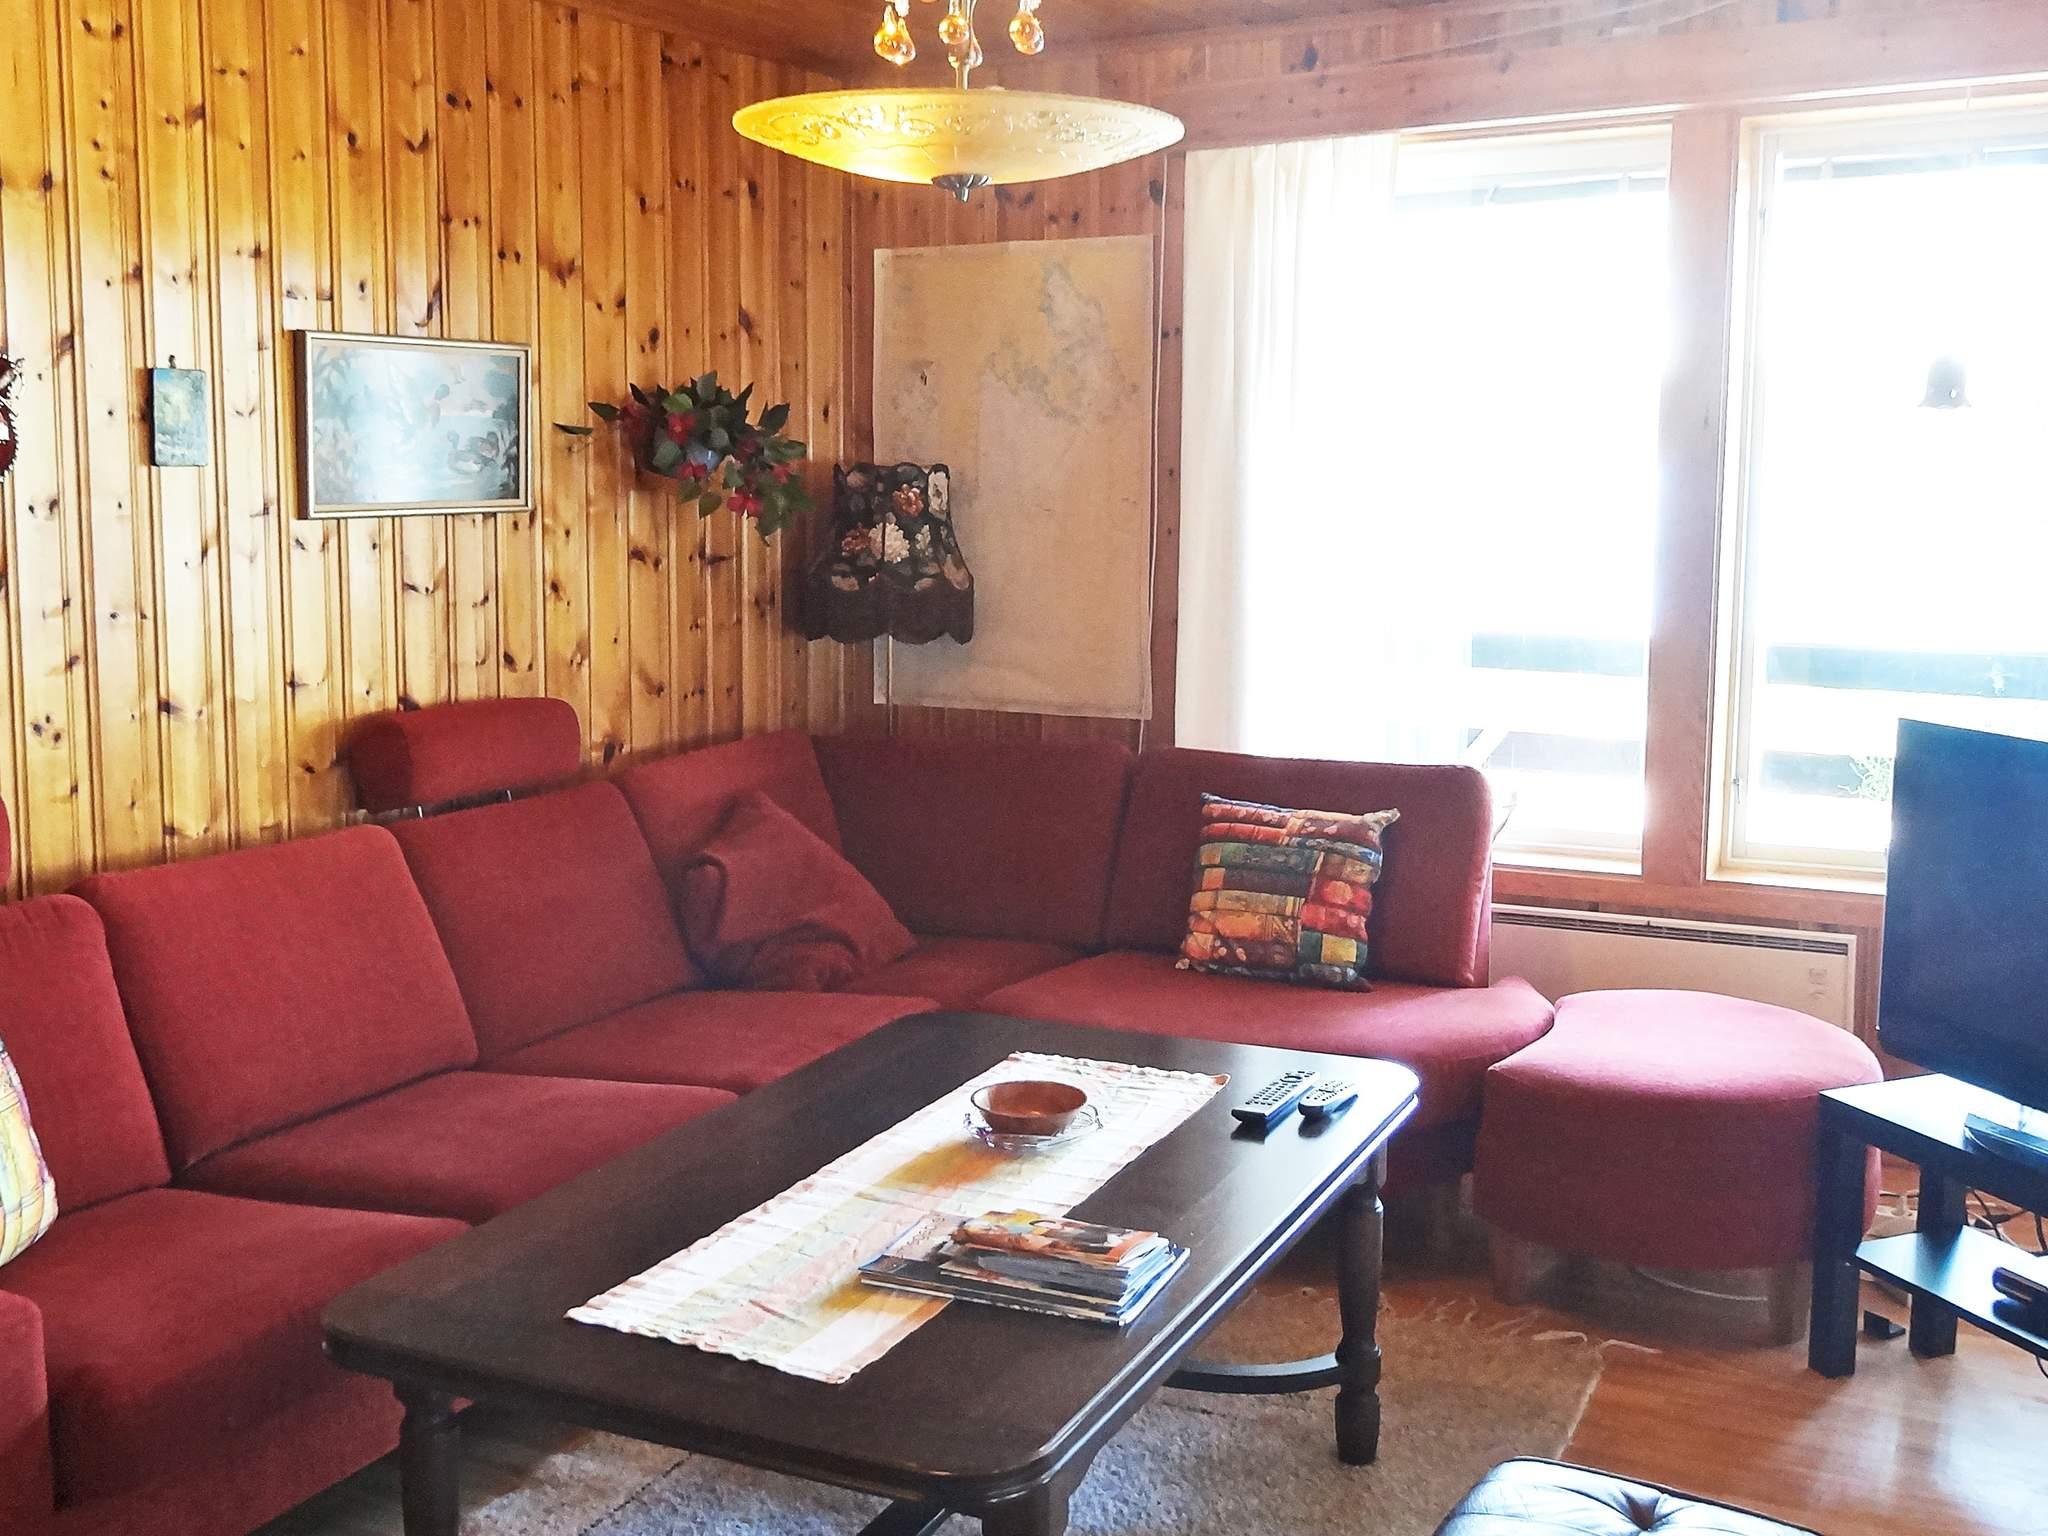 Ferienhaus Nordmaling (1026050), Lögdeå, Västerbottens län, Nordschweden, Schweden, Bild 2